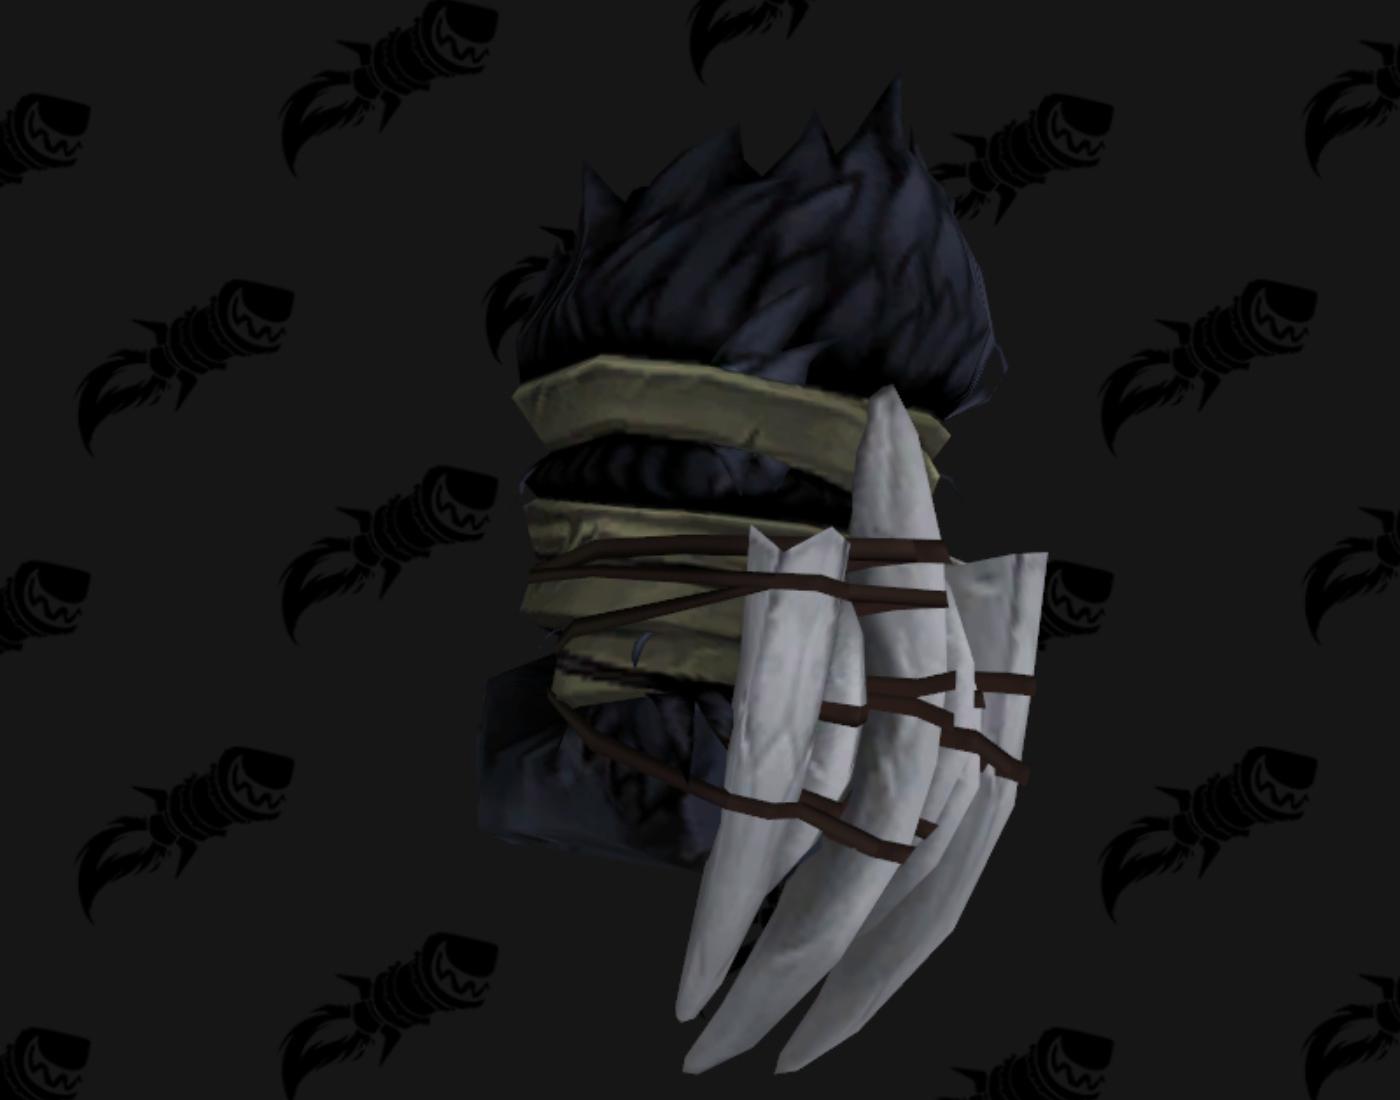 Arme de pugilat - Siège de Zuldazar